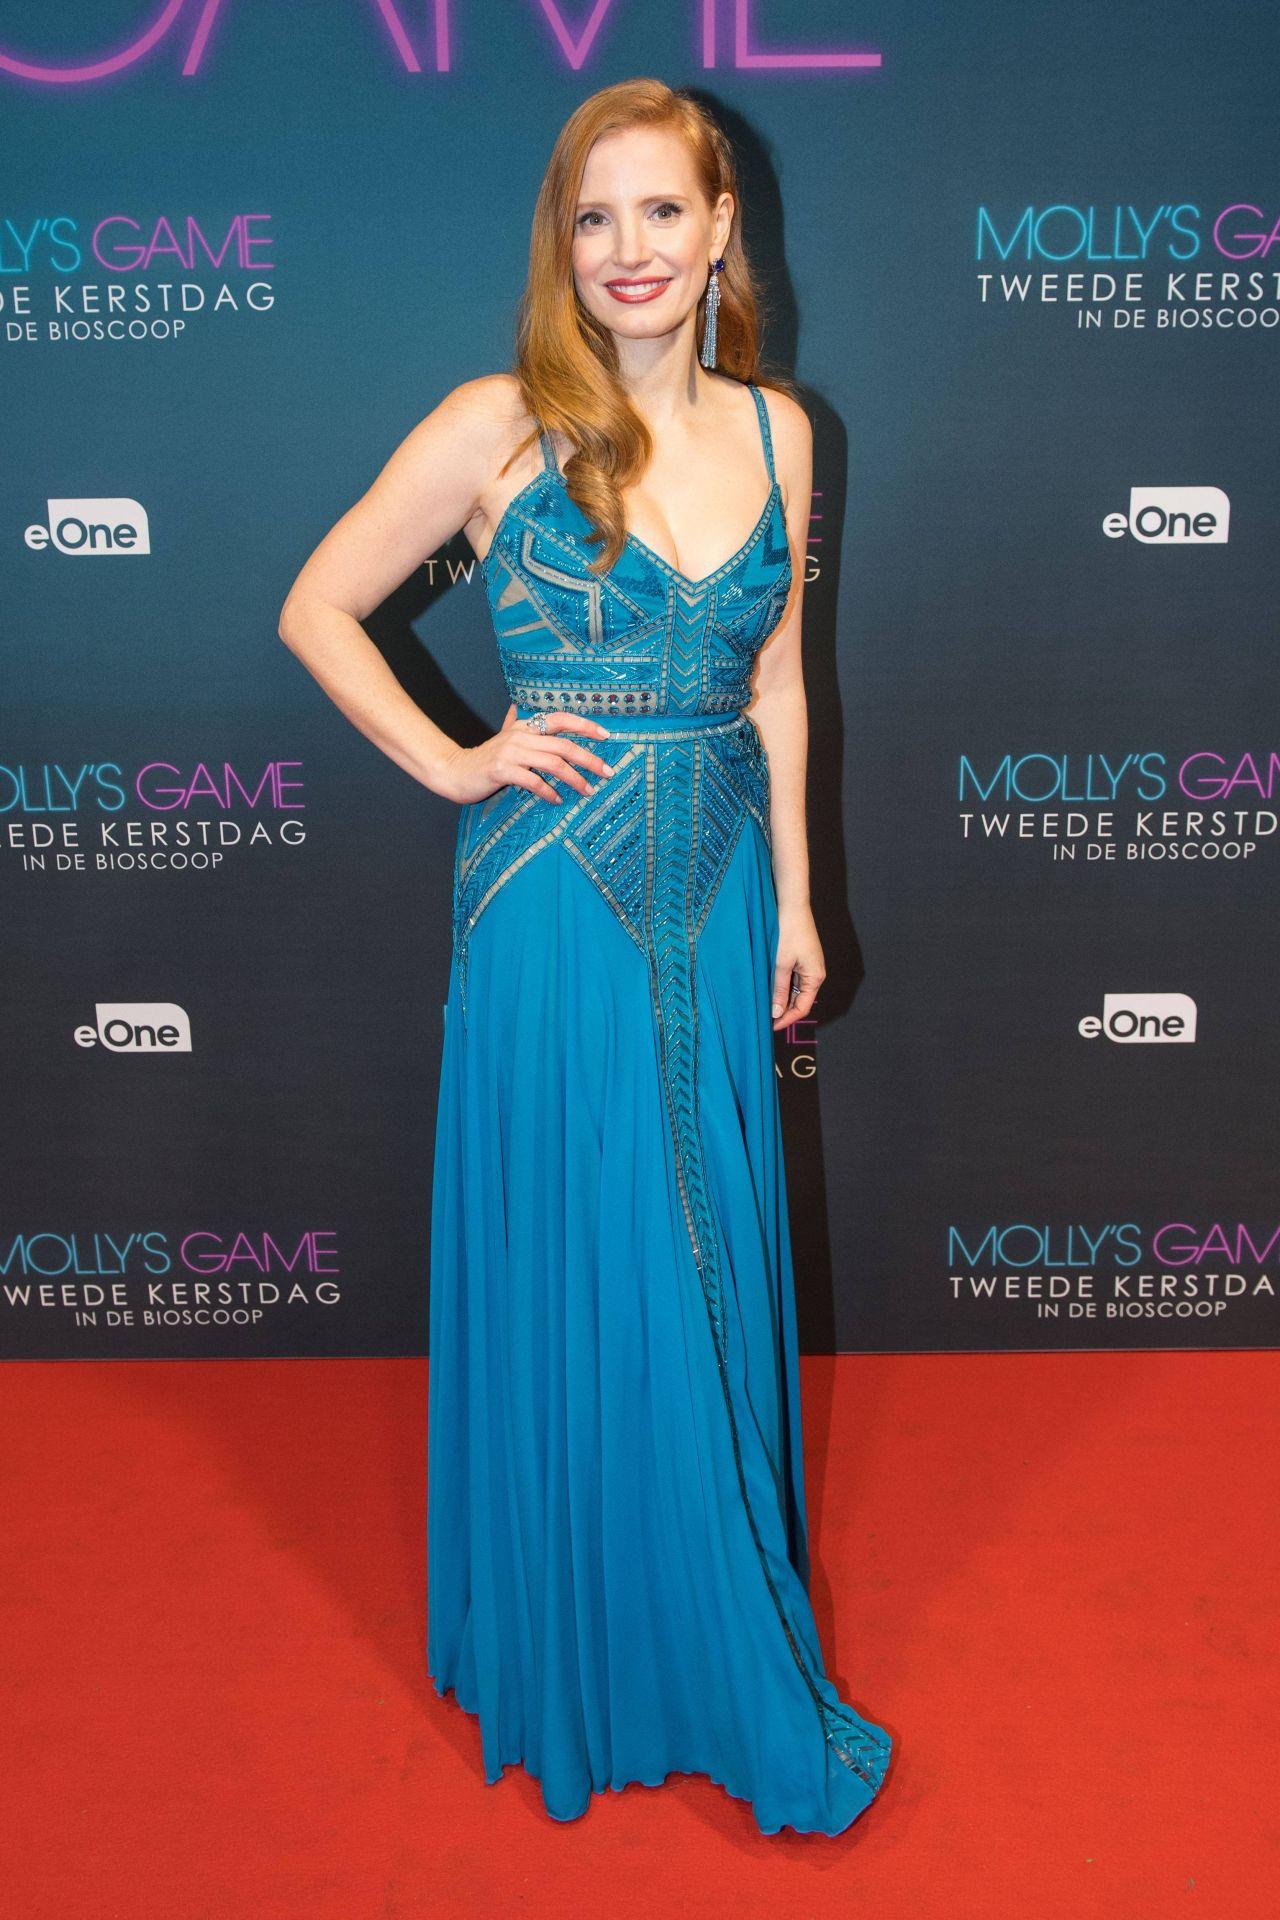 http://celebmafia.com/wp-content/uploads/2017/12/jessica-chastain-molly-s-game-premiere-in-amsterdam-2.jpg